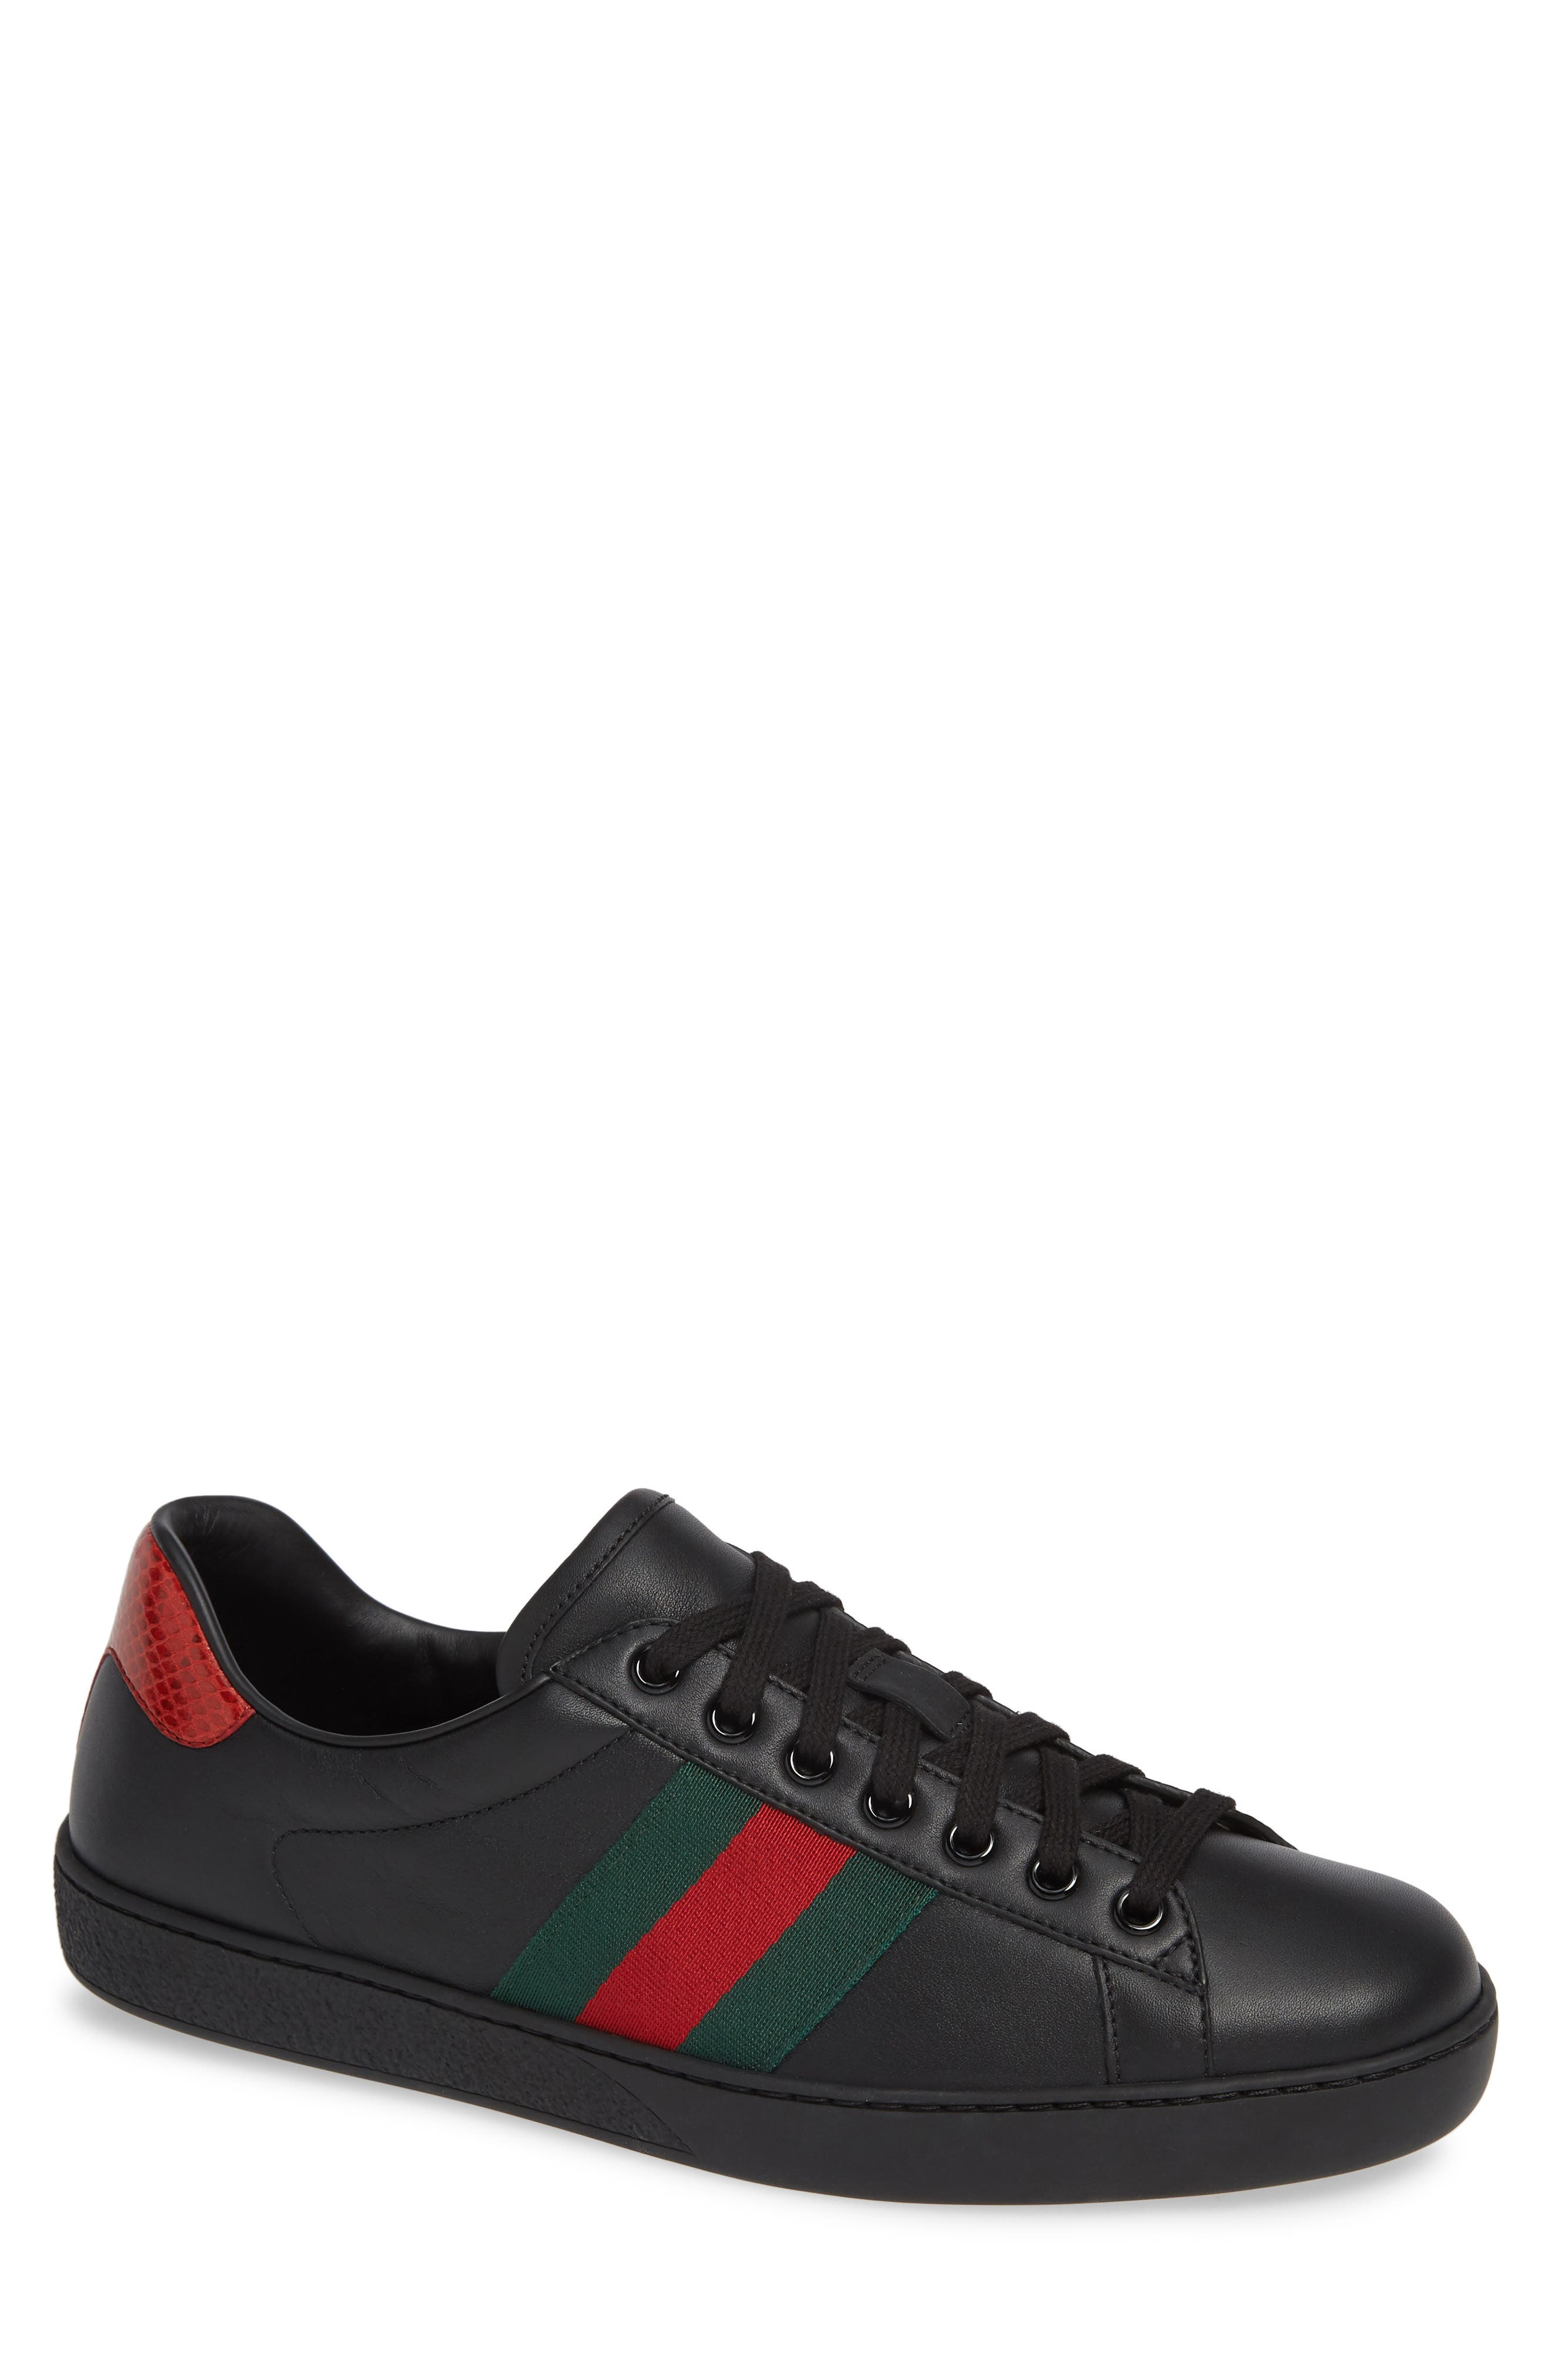 mens black athletic shoes